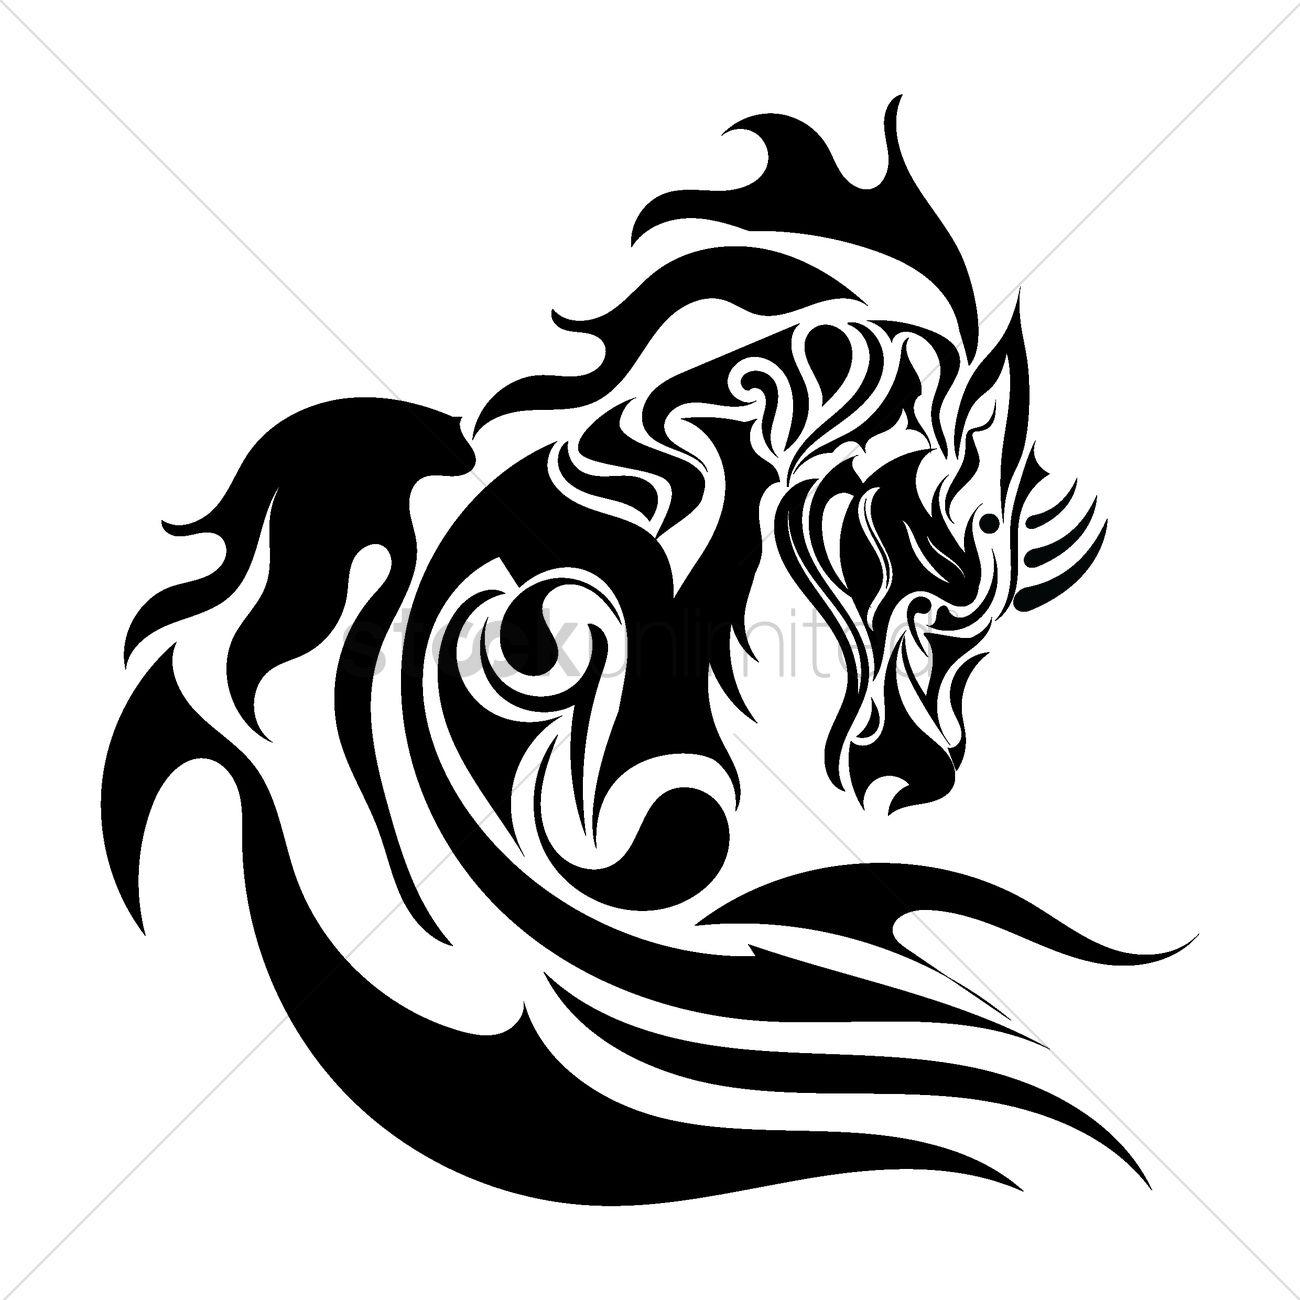 Horse Tattoo Design Vector Image 1433368 Stockunlimited